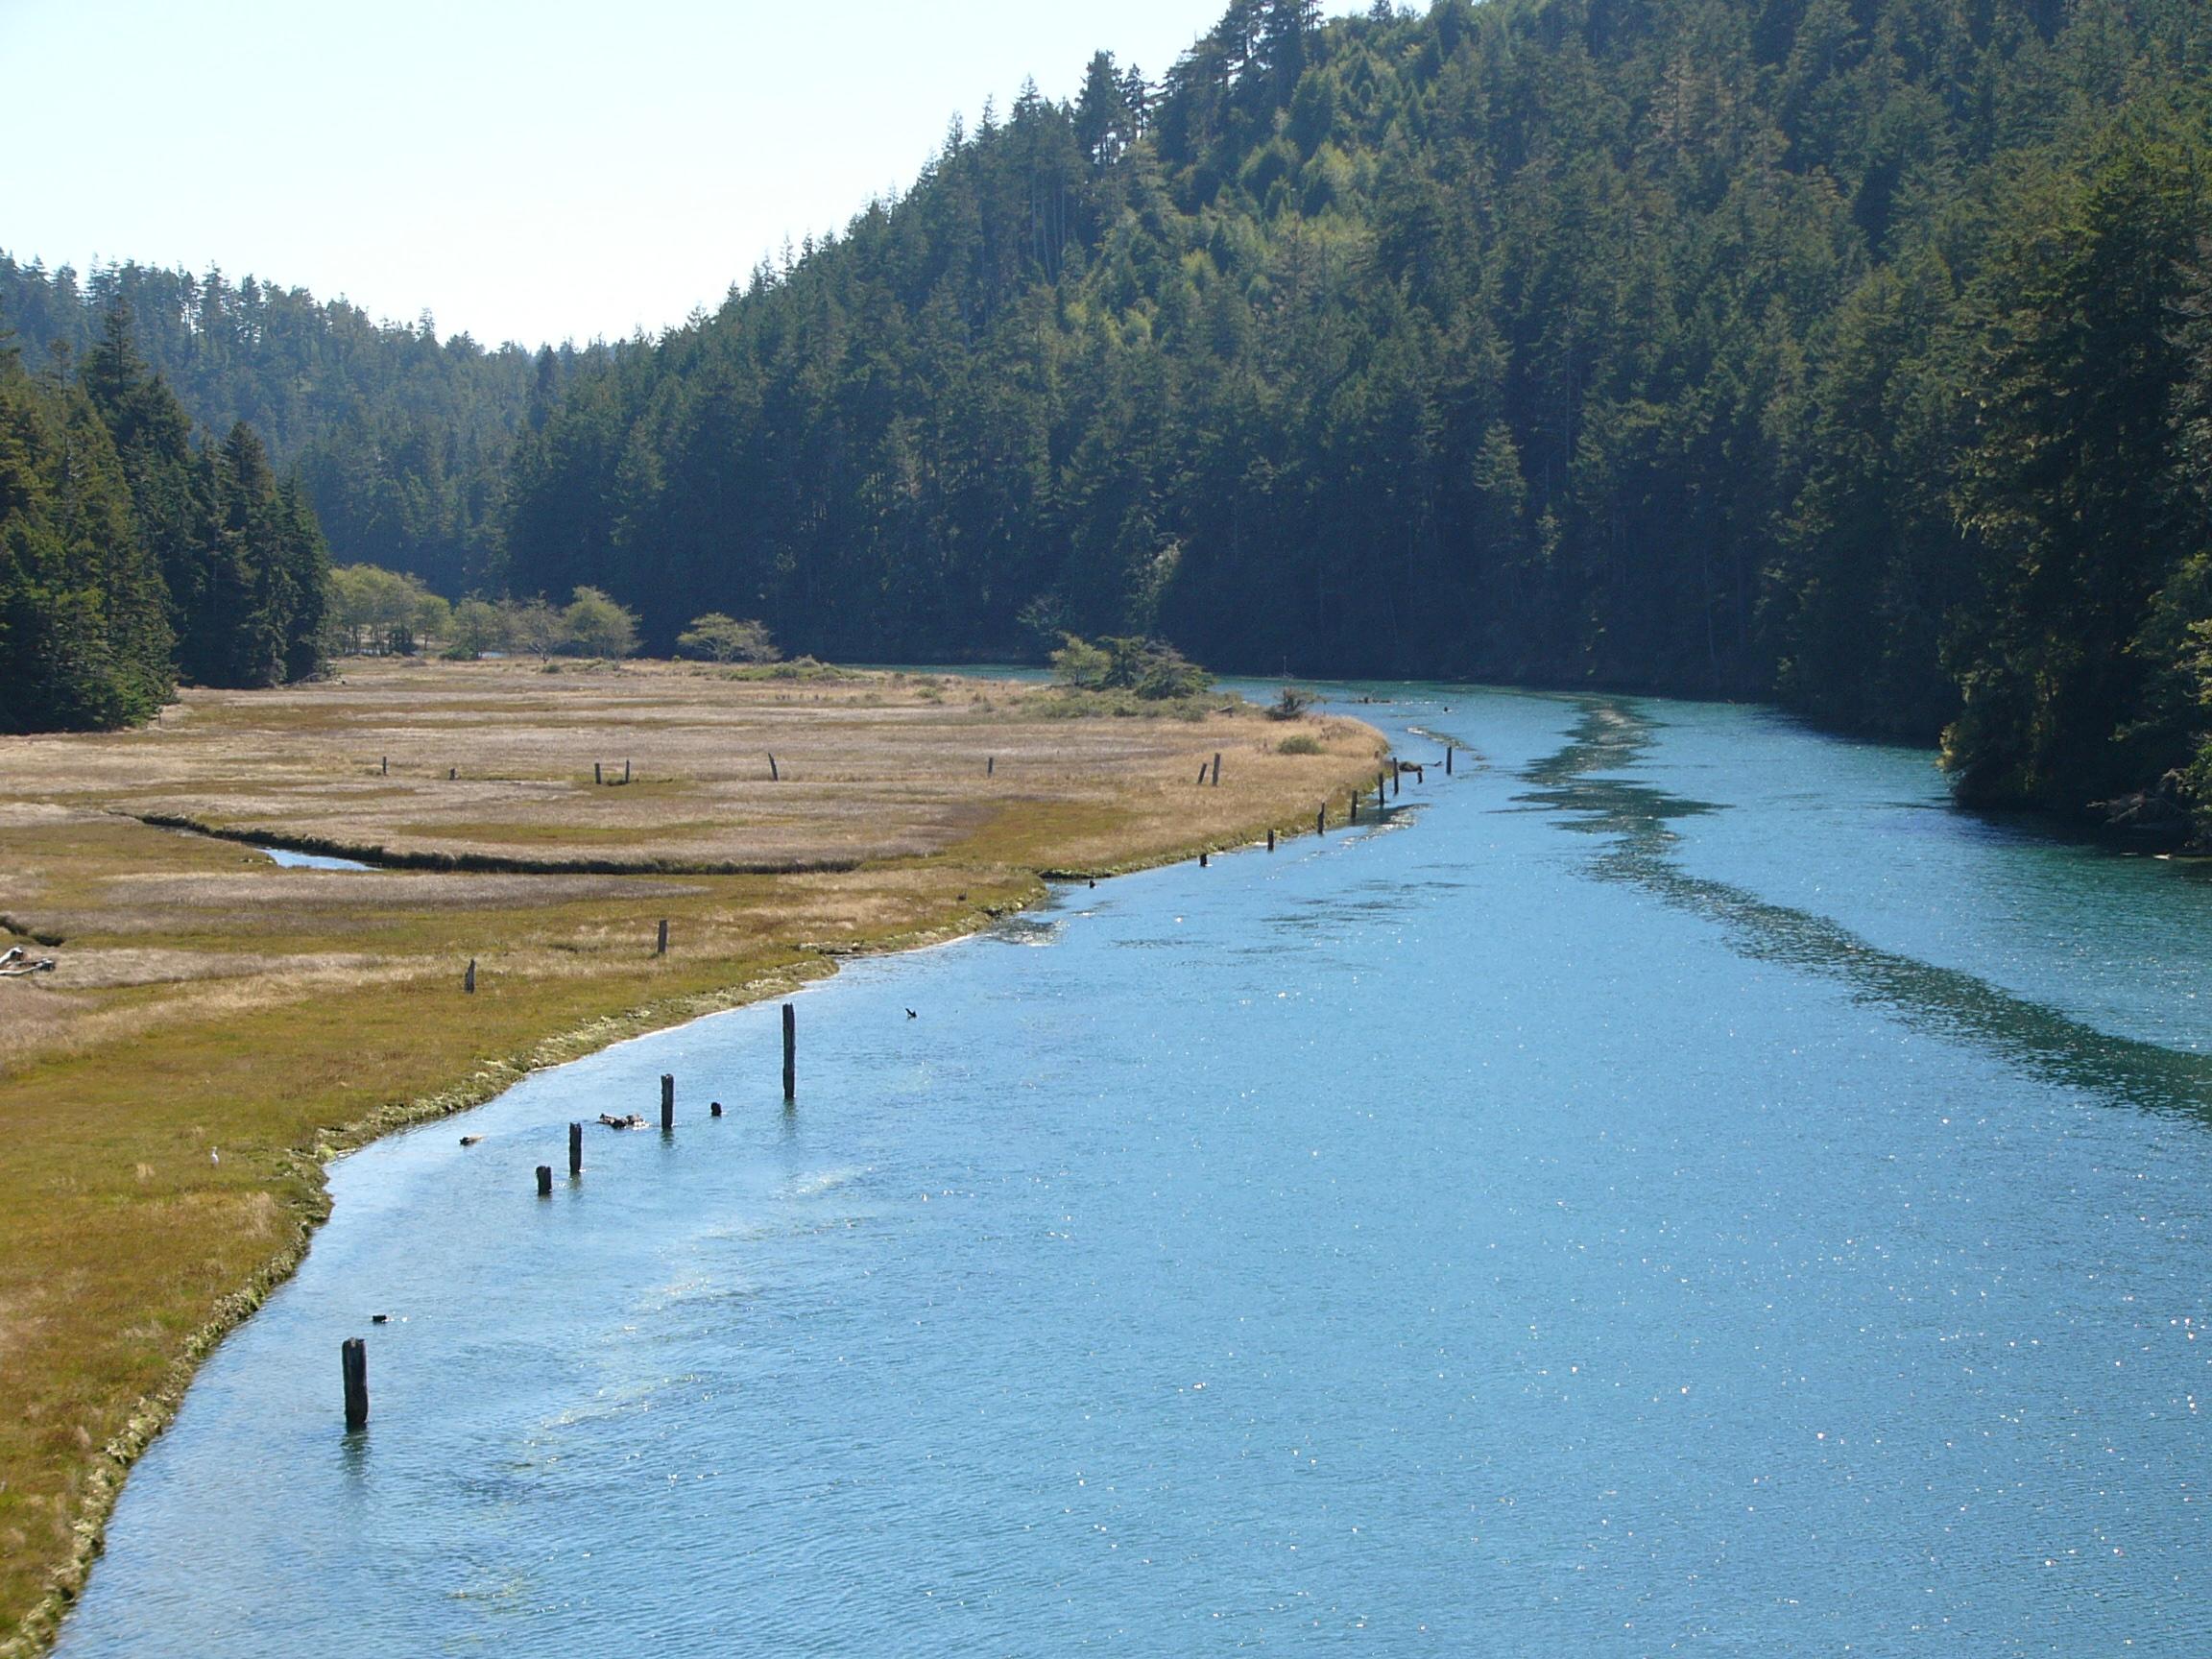 FileBig River Californiajpg Wikimedia Commons - Big river